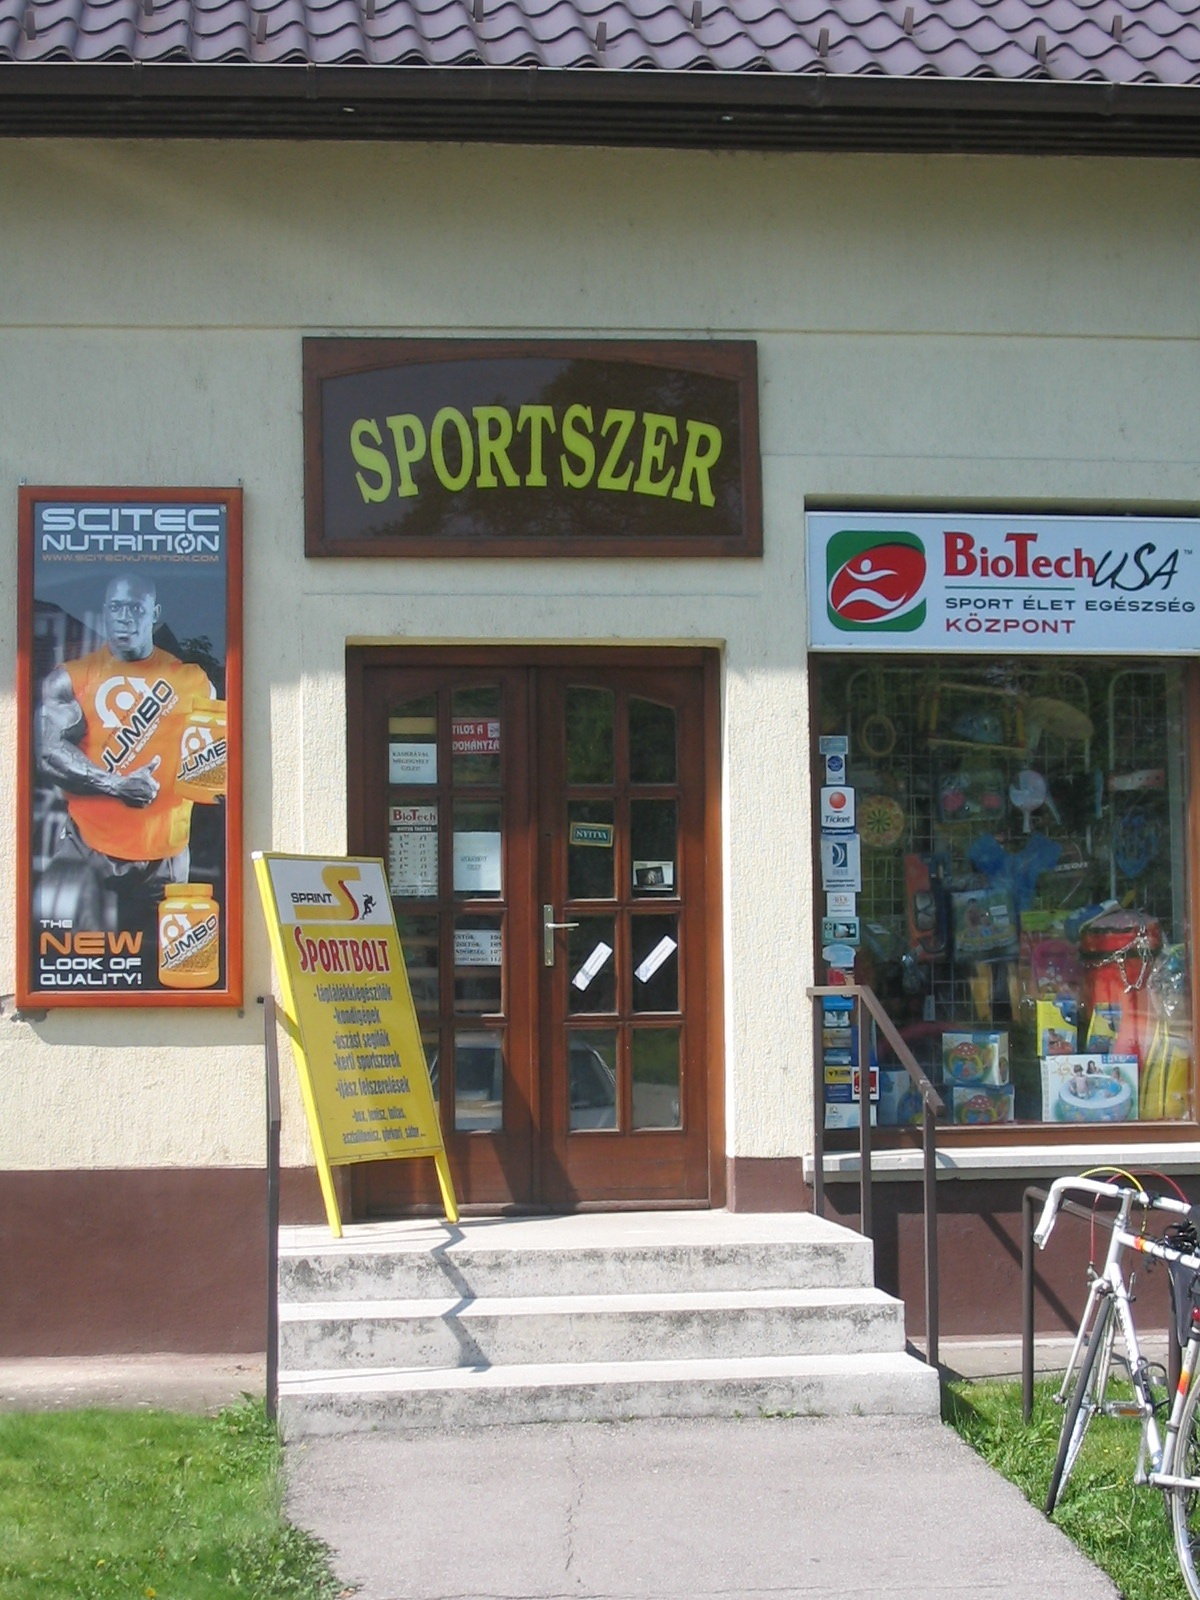 Sprint Sportbolt